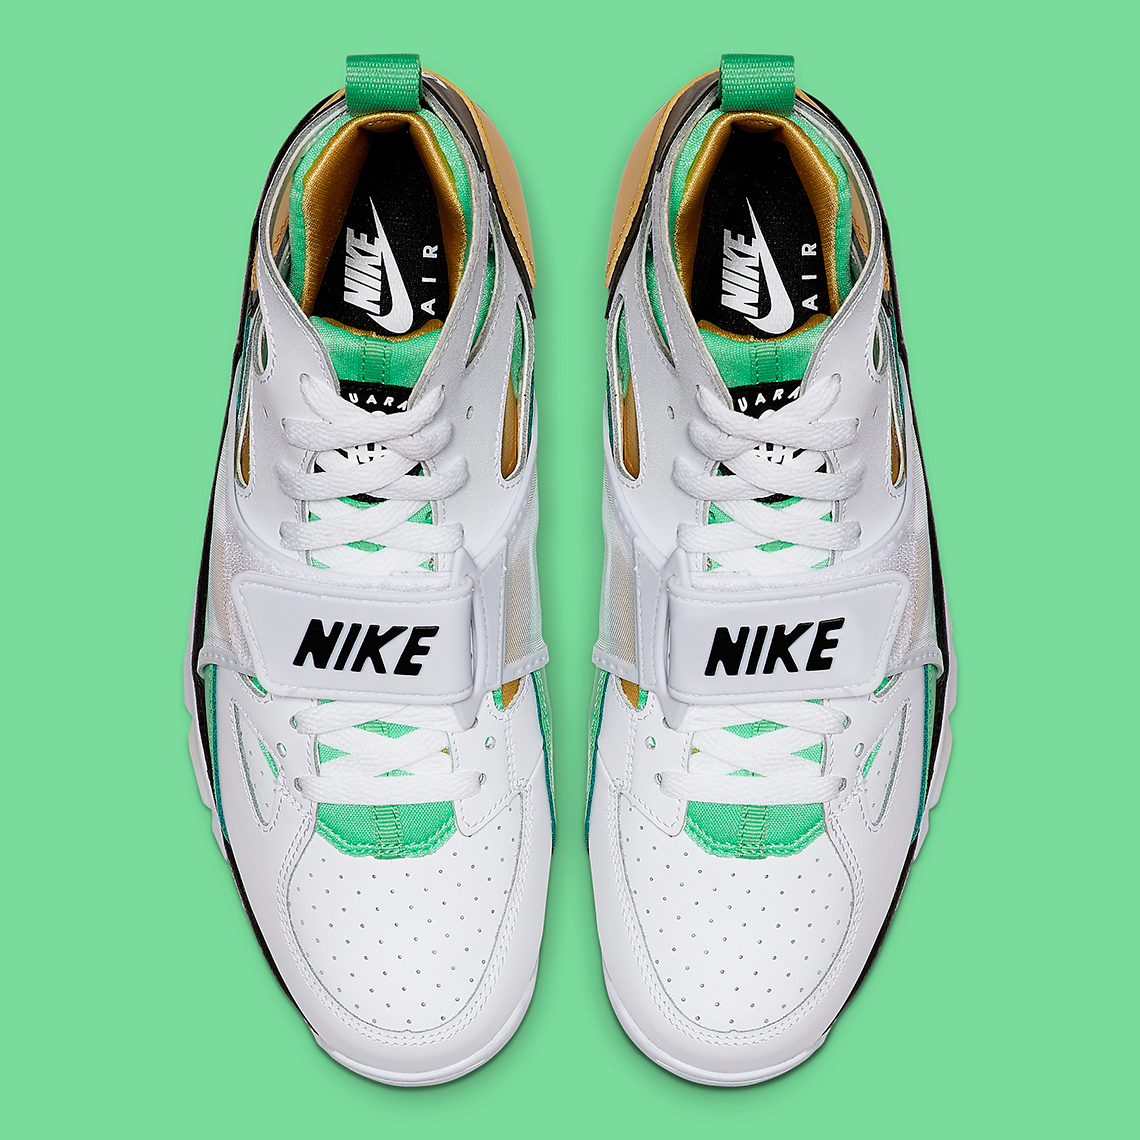 Nike Trainer Huarache White Gold Green 679083-108   SneakerNews.com